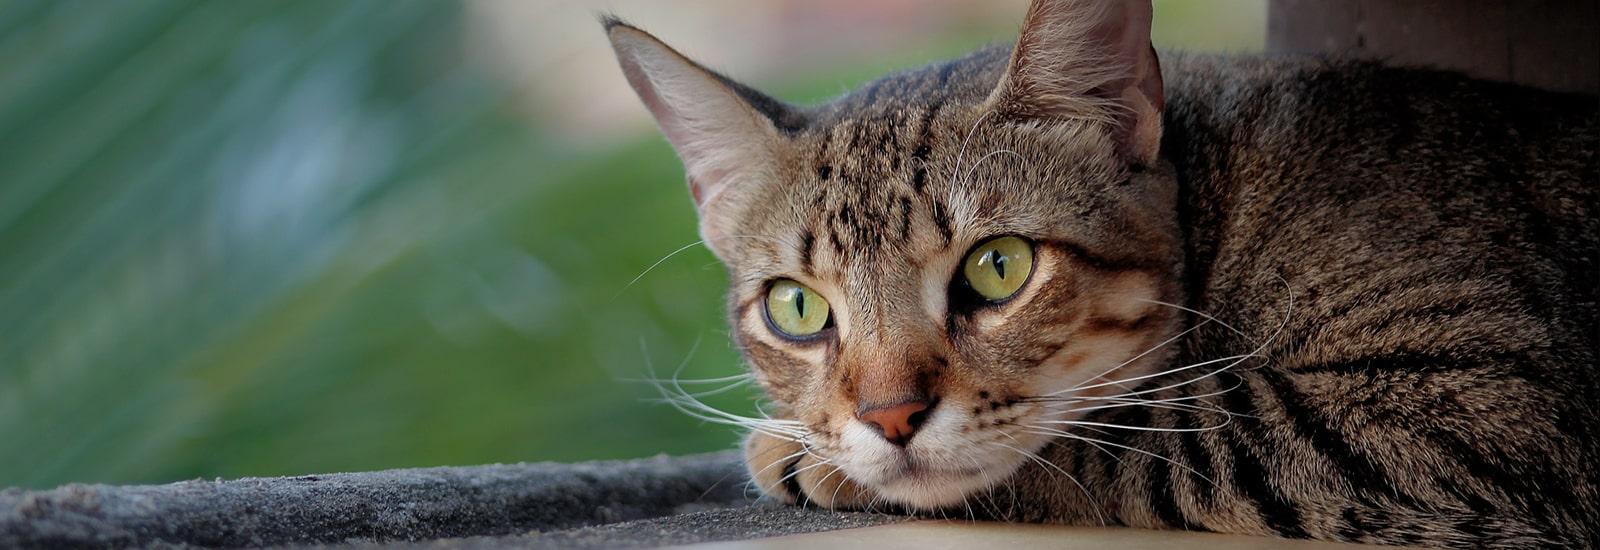 Cat Banner Image